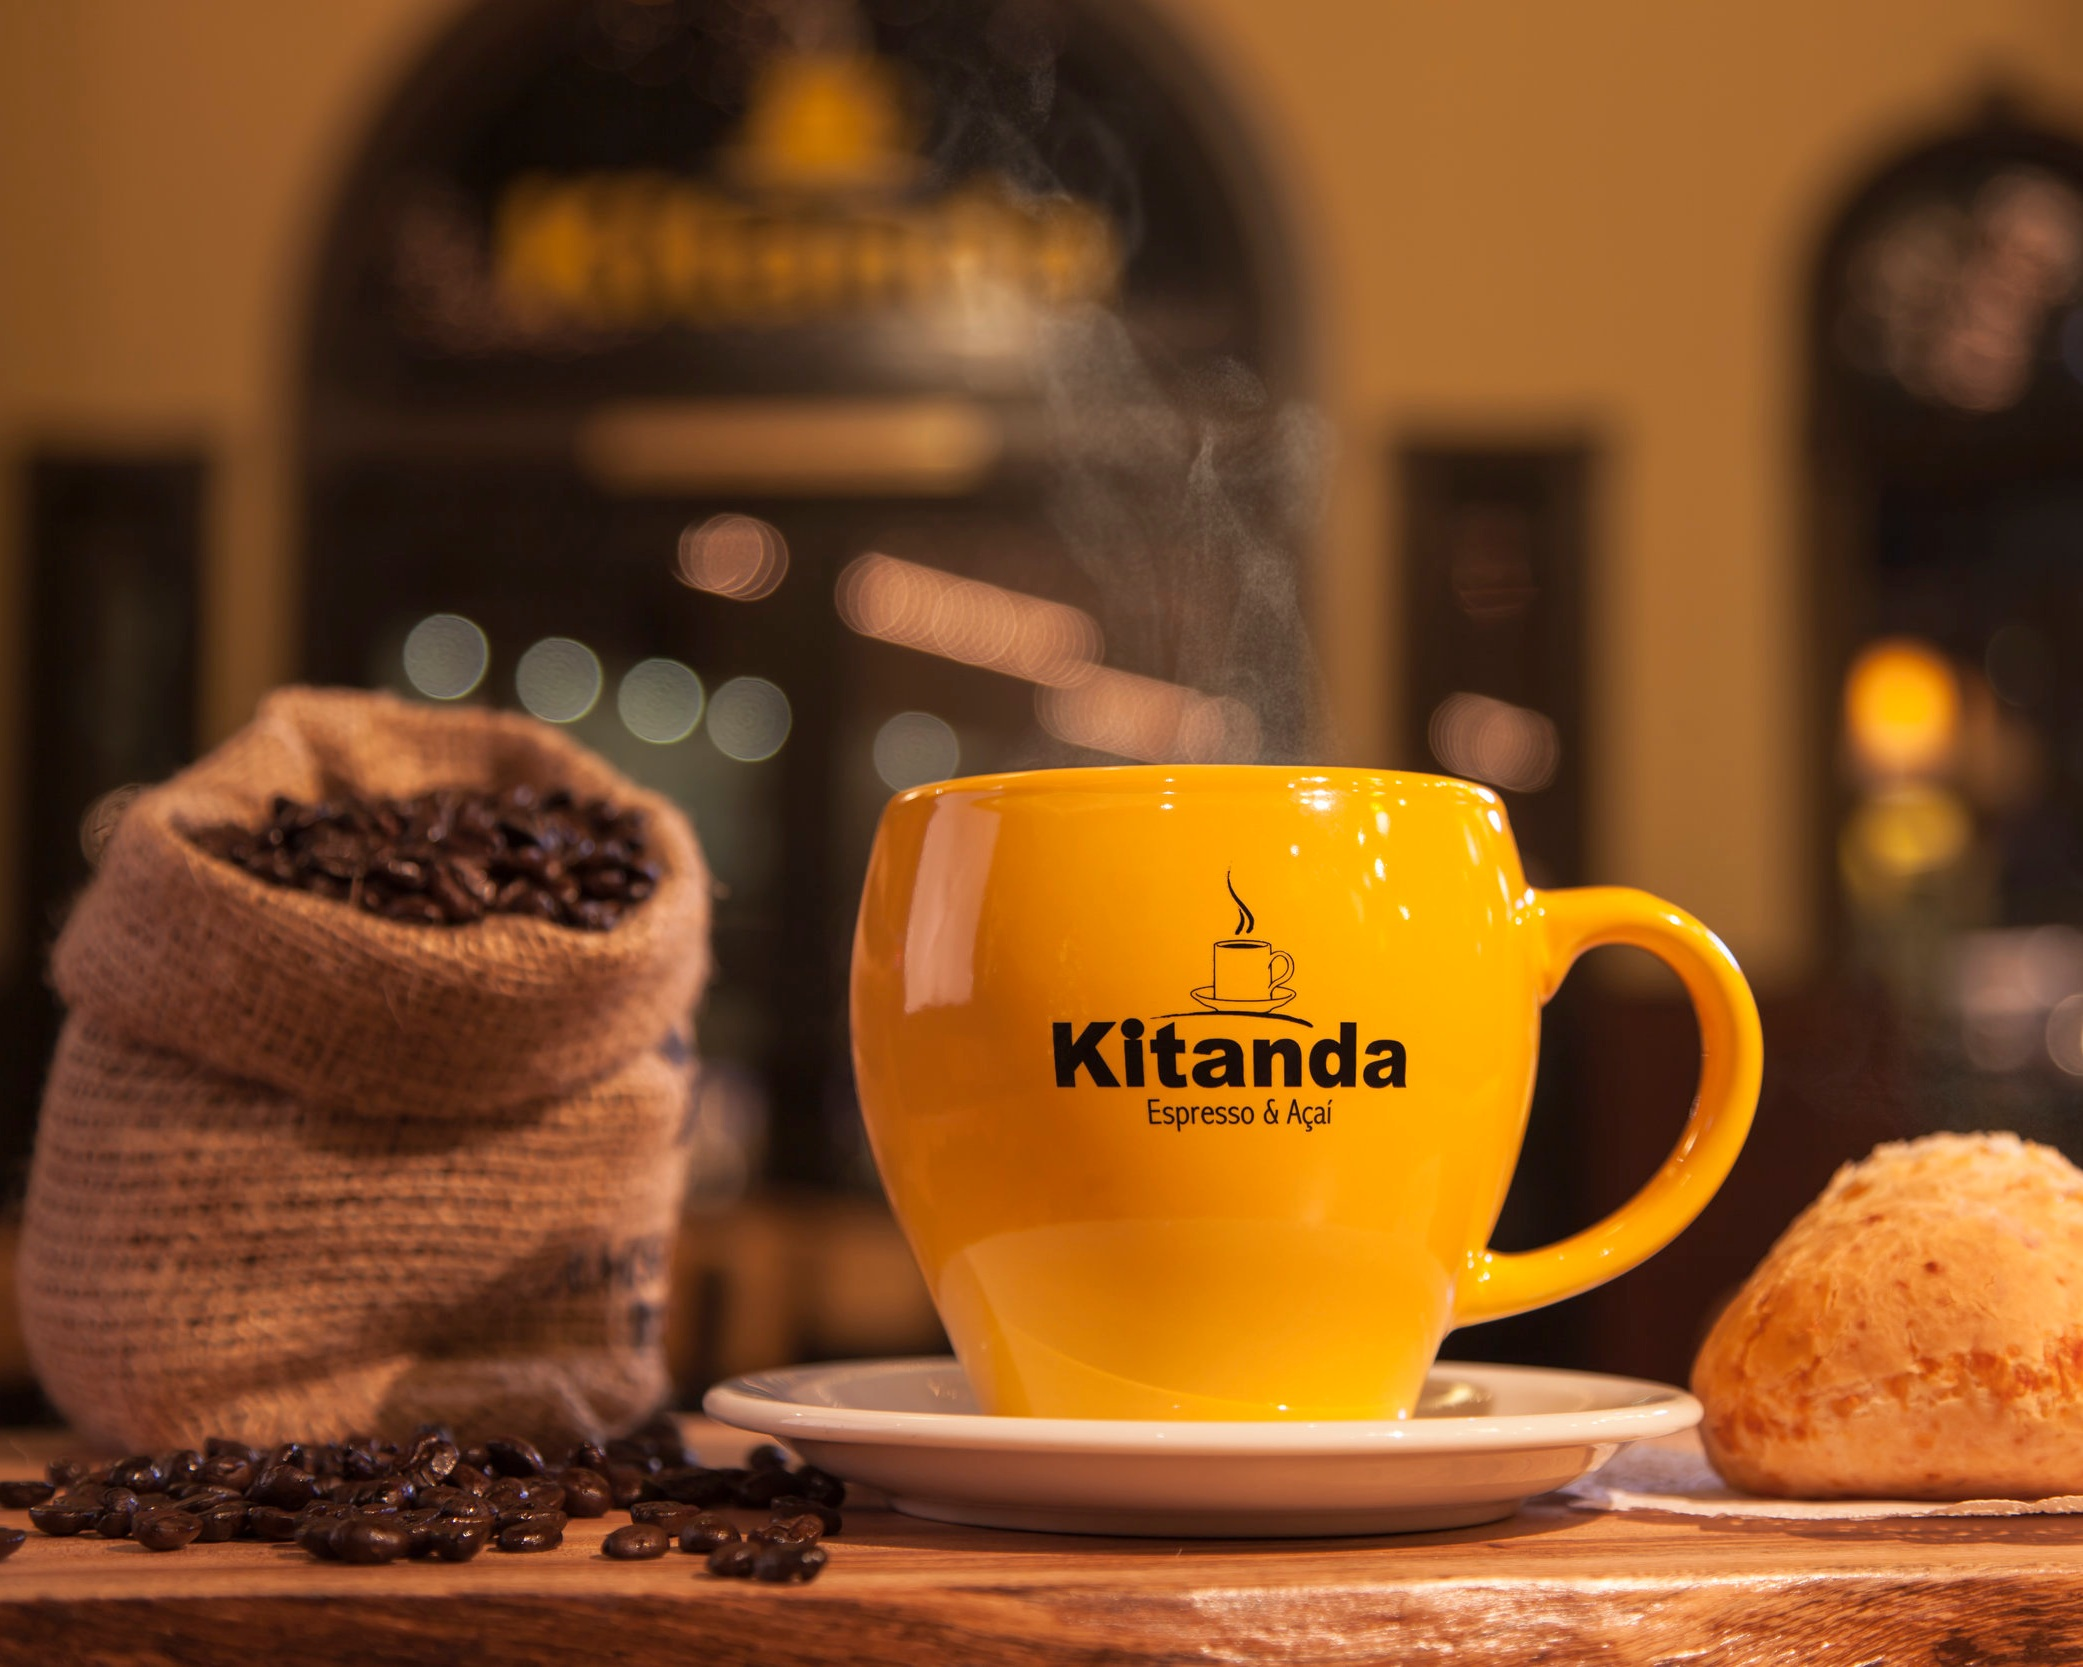 20131130_Kitanda_Coffee_5DII_MG_9074-Edit.jpg